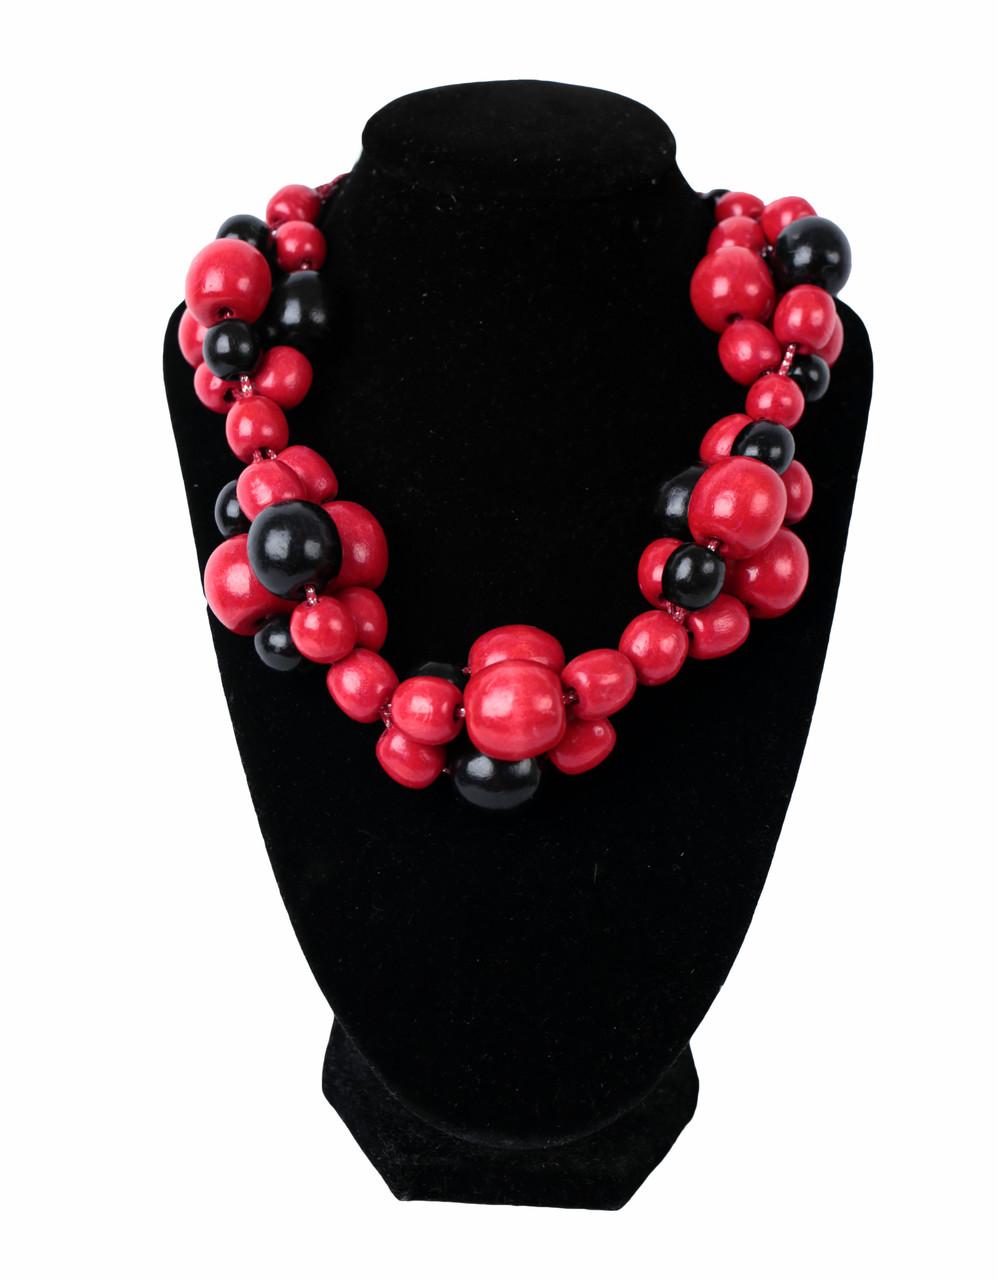 Намисто дерев яне червоно-чорне  продажа fec8cec788afa